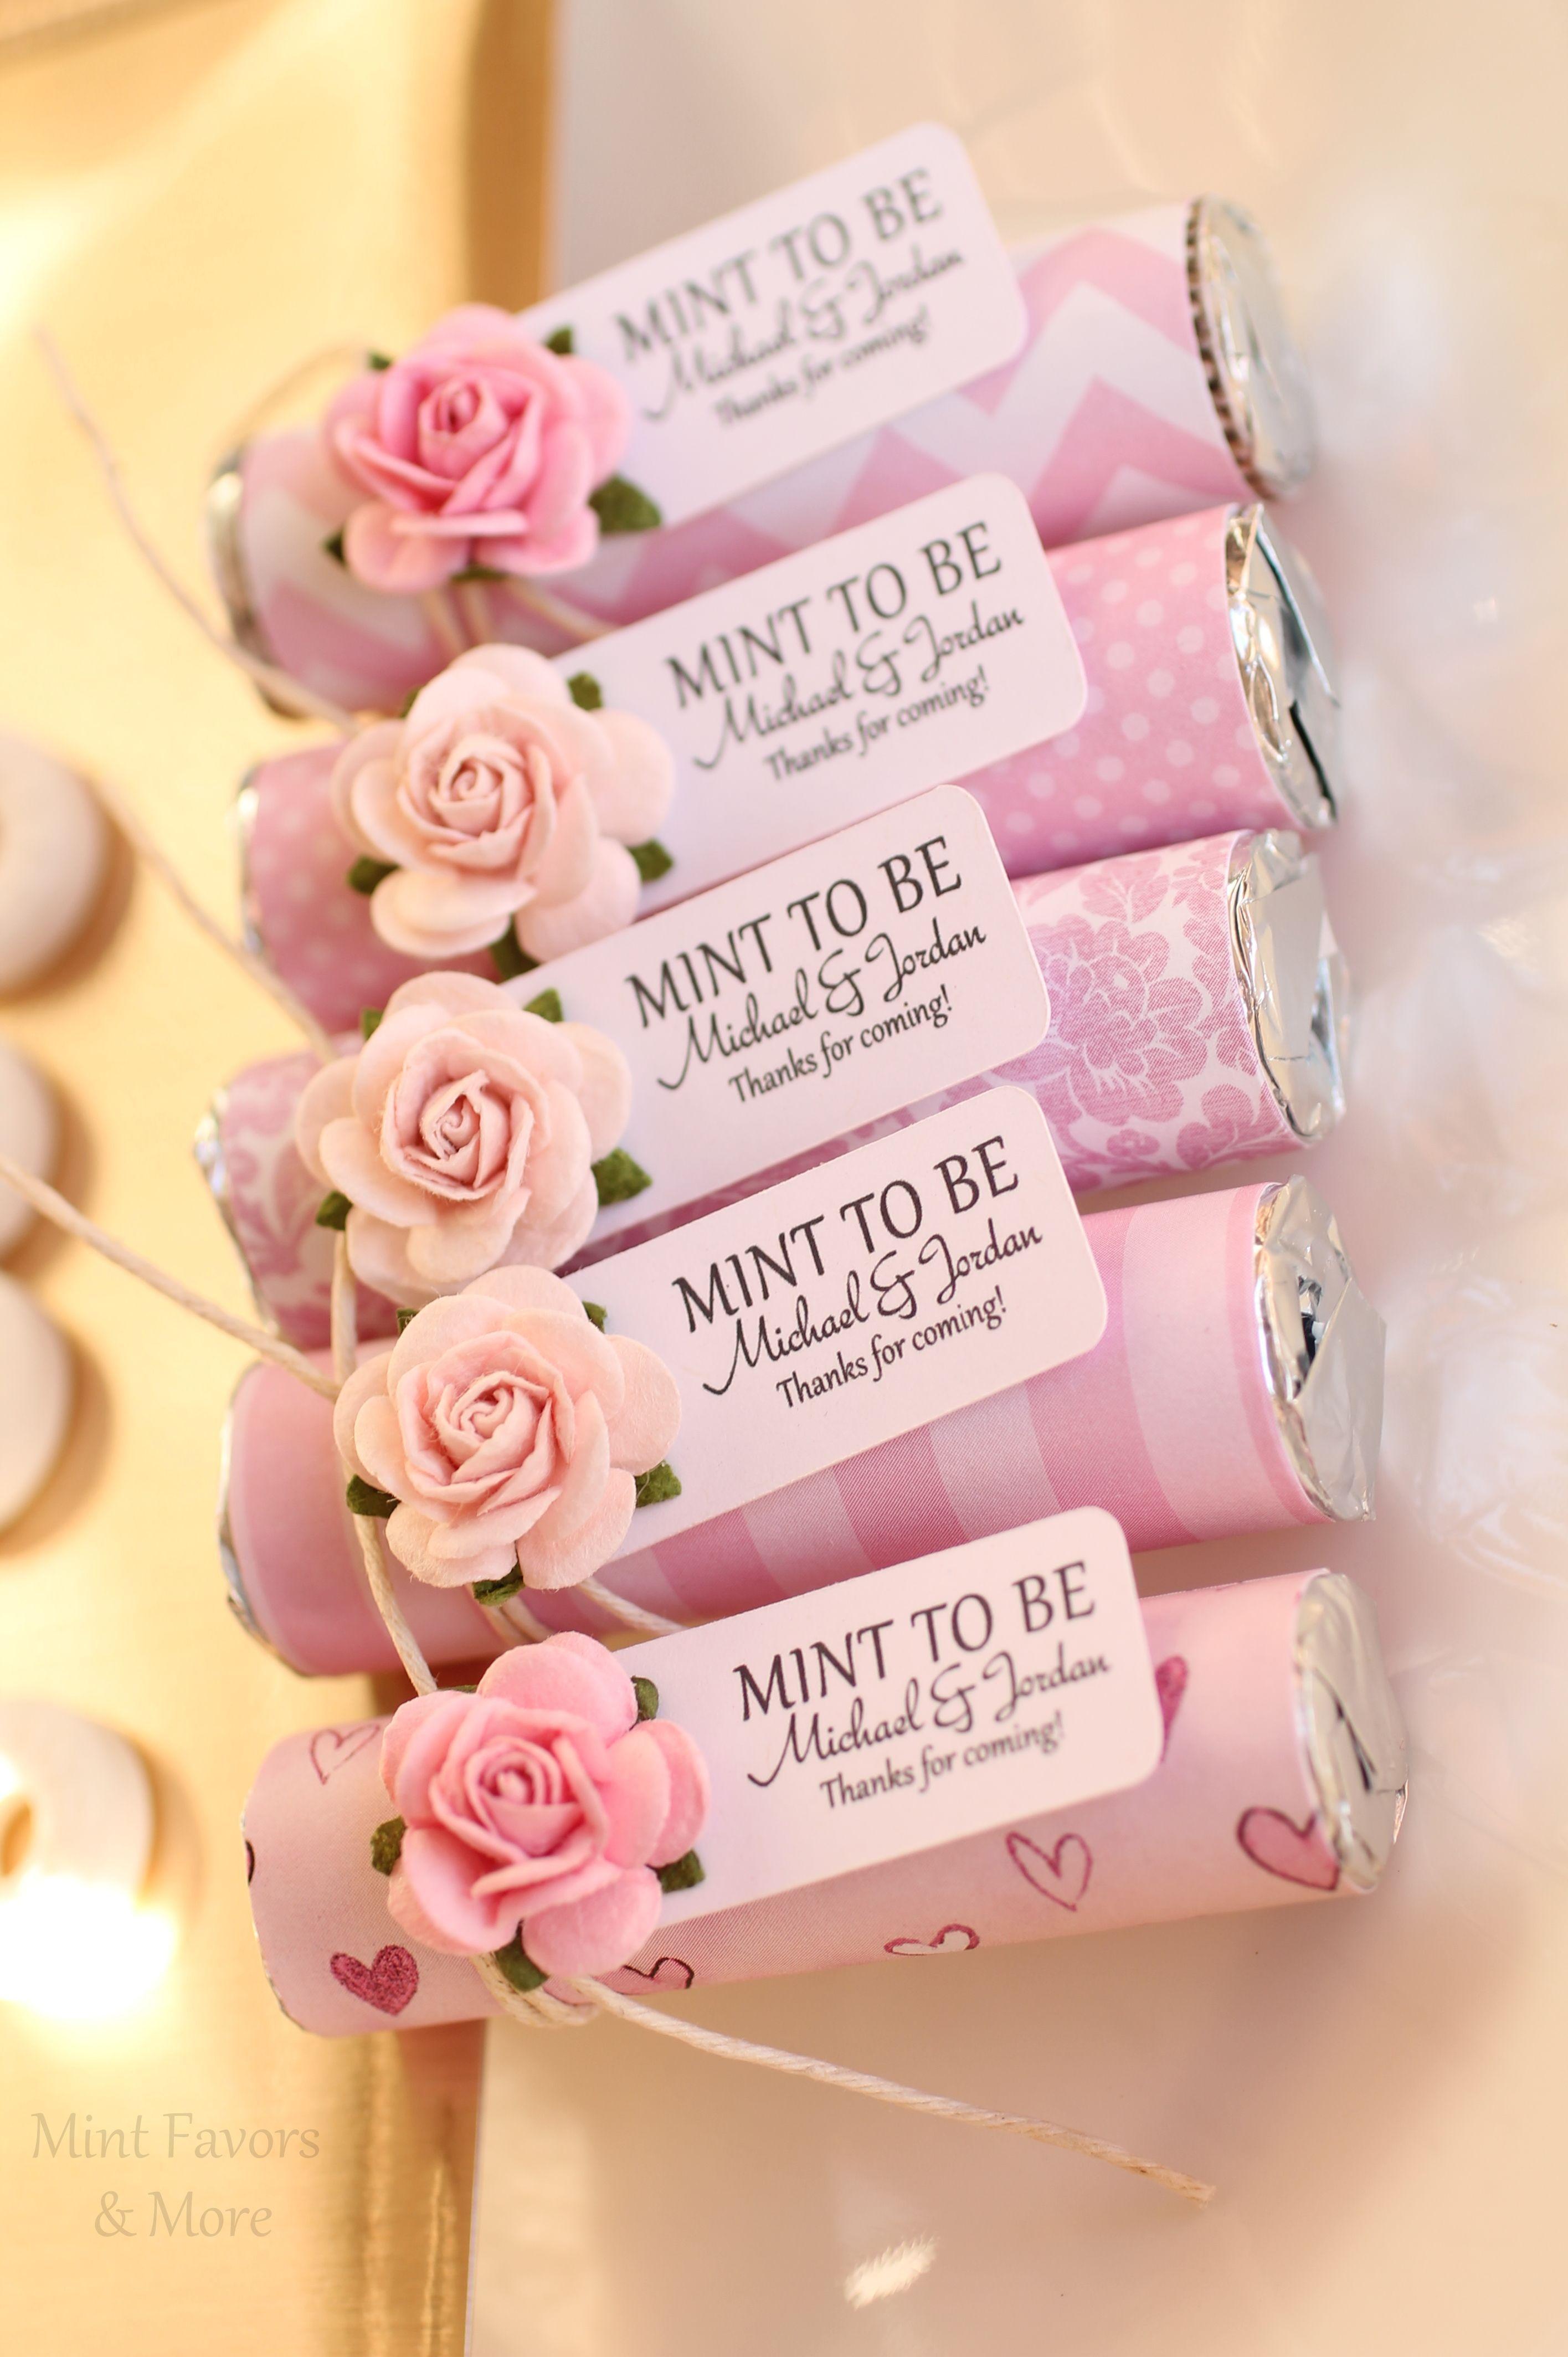 Mints pretty in pink! Wedding favors by @mintfavors ...